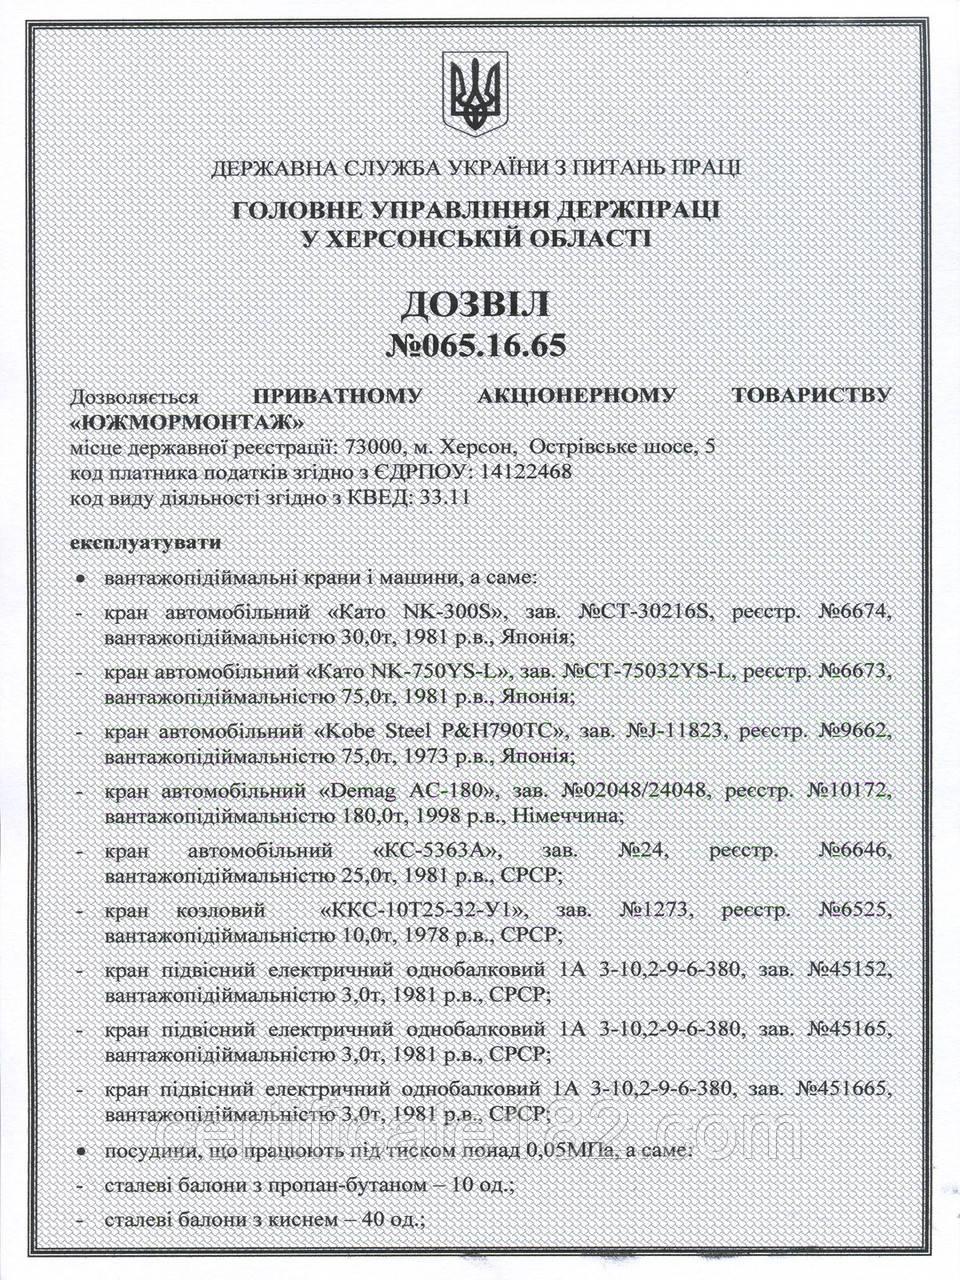 Сертификация зарубежных кранов сертификация 9001 отчет